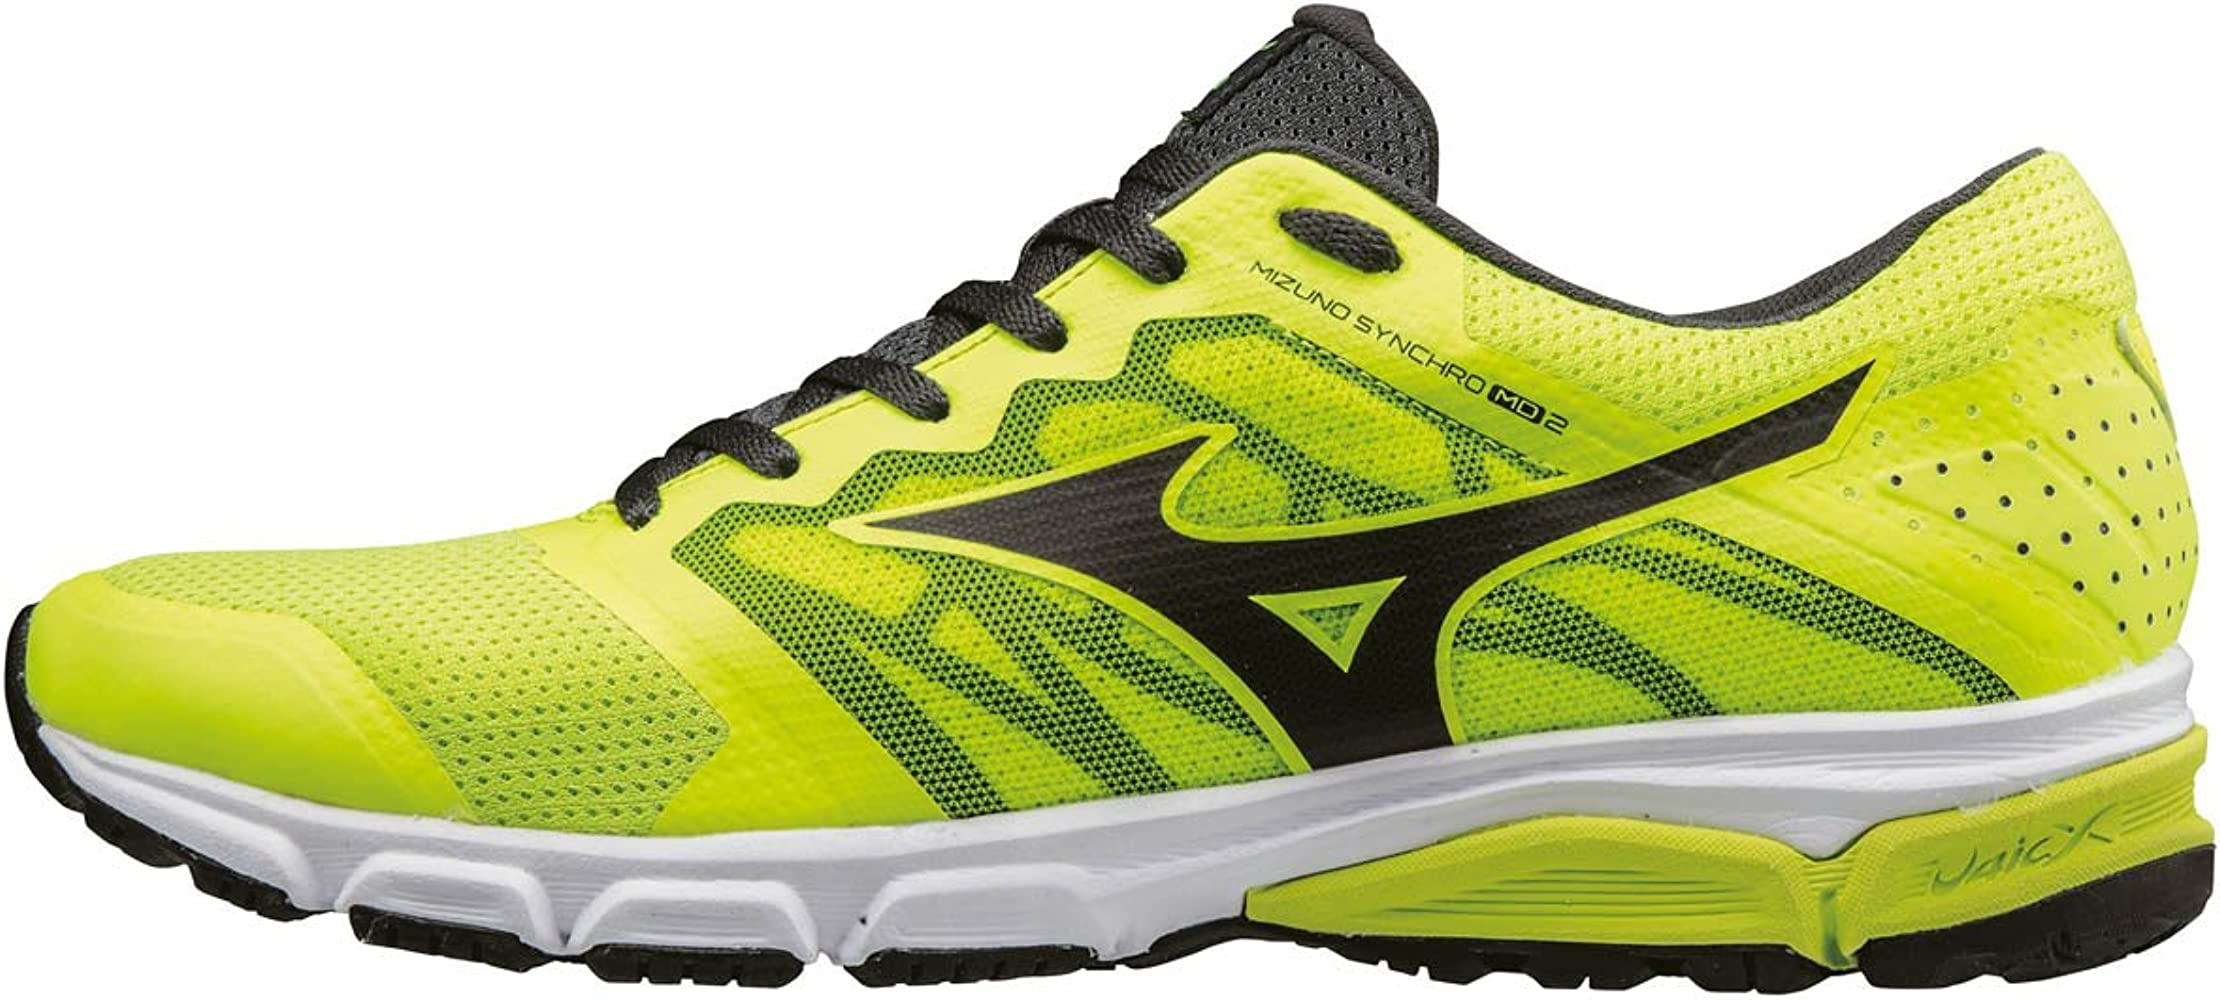 Mizuno Synchro MD 2, Zapatillas de Running para Hombre, Amarillo ...